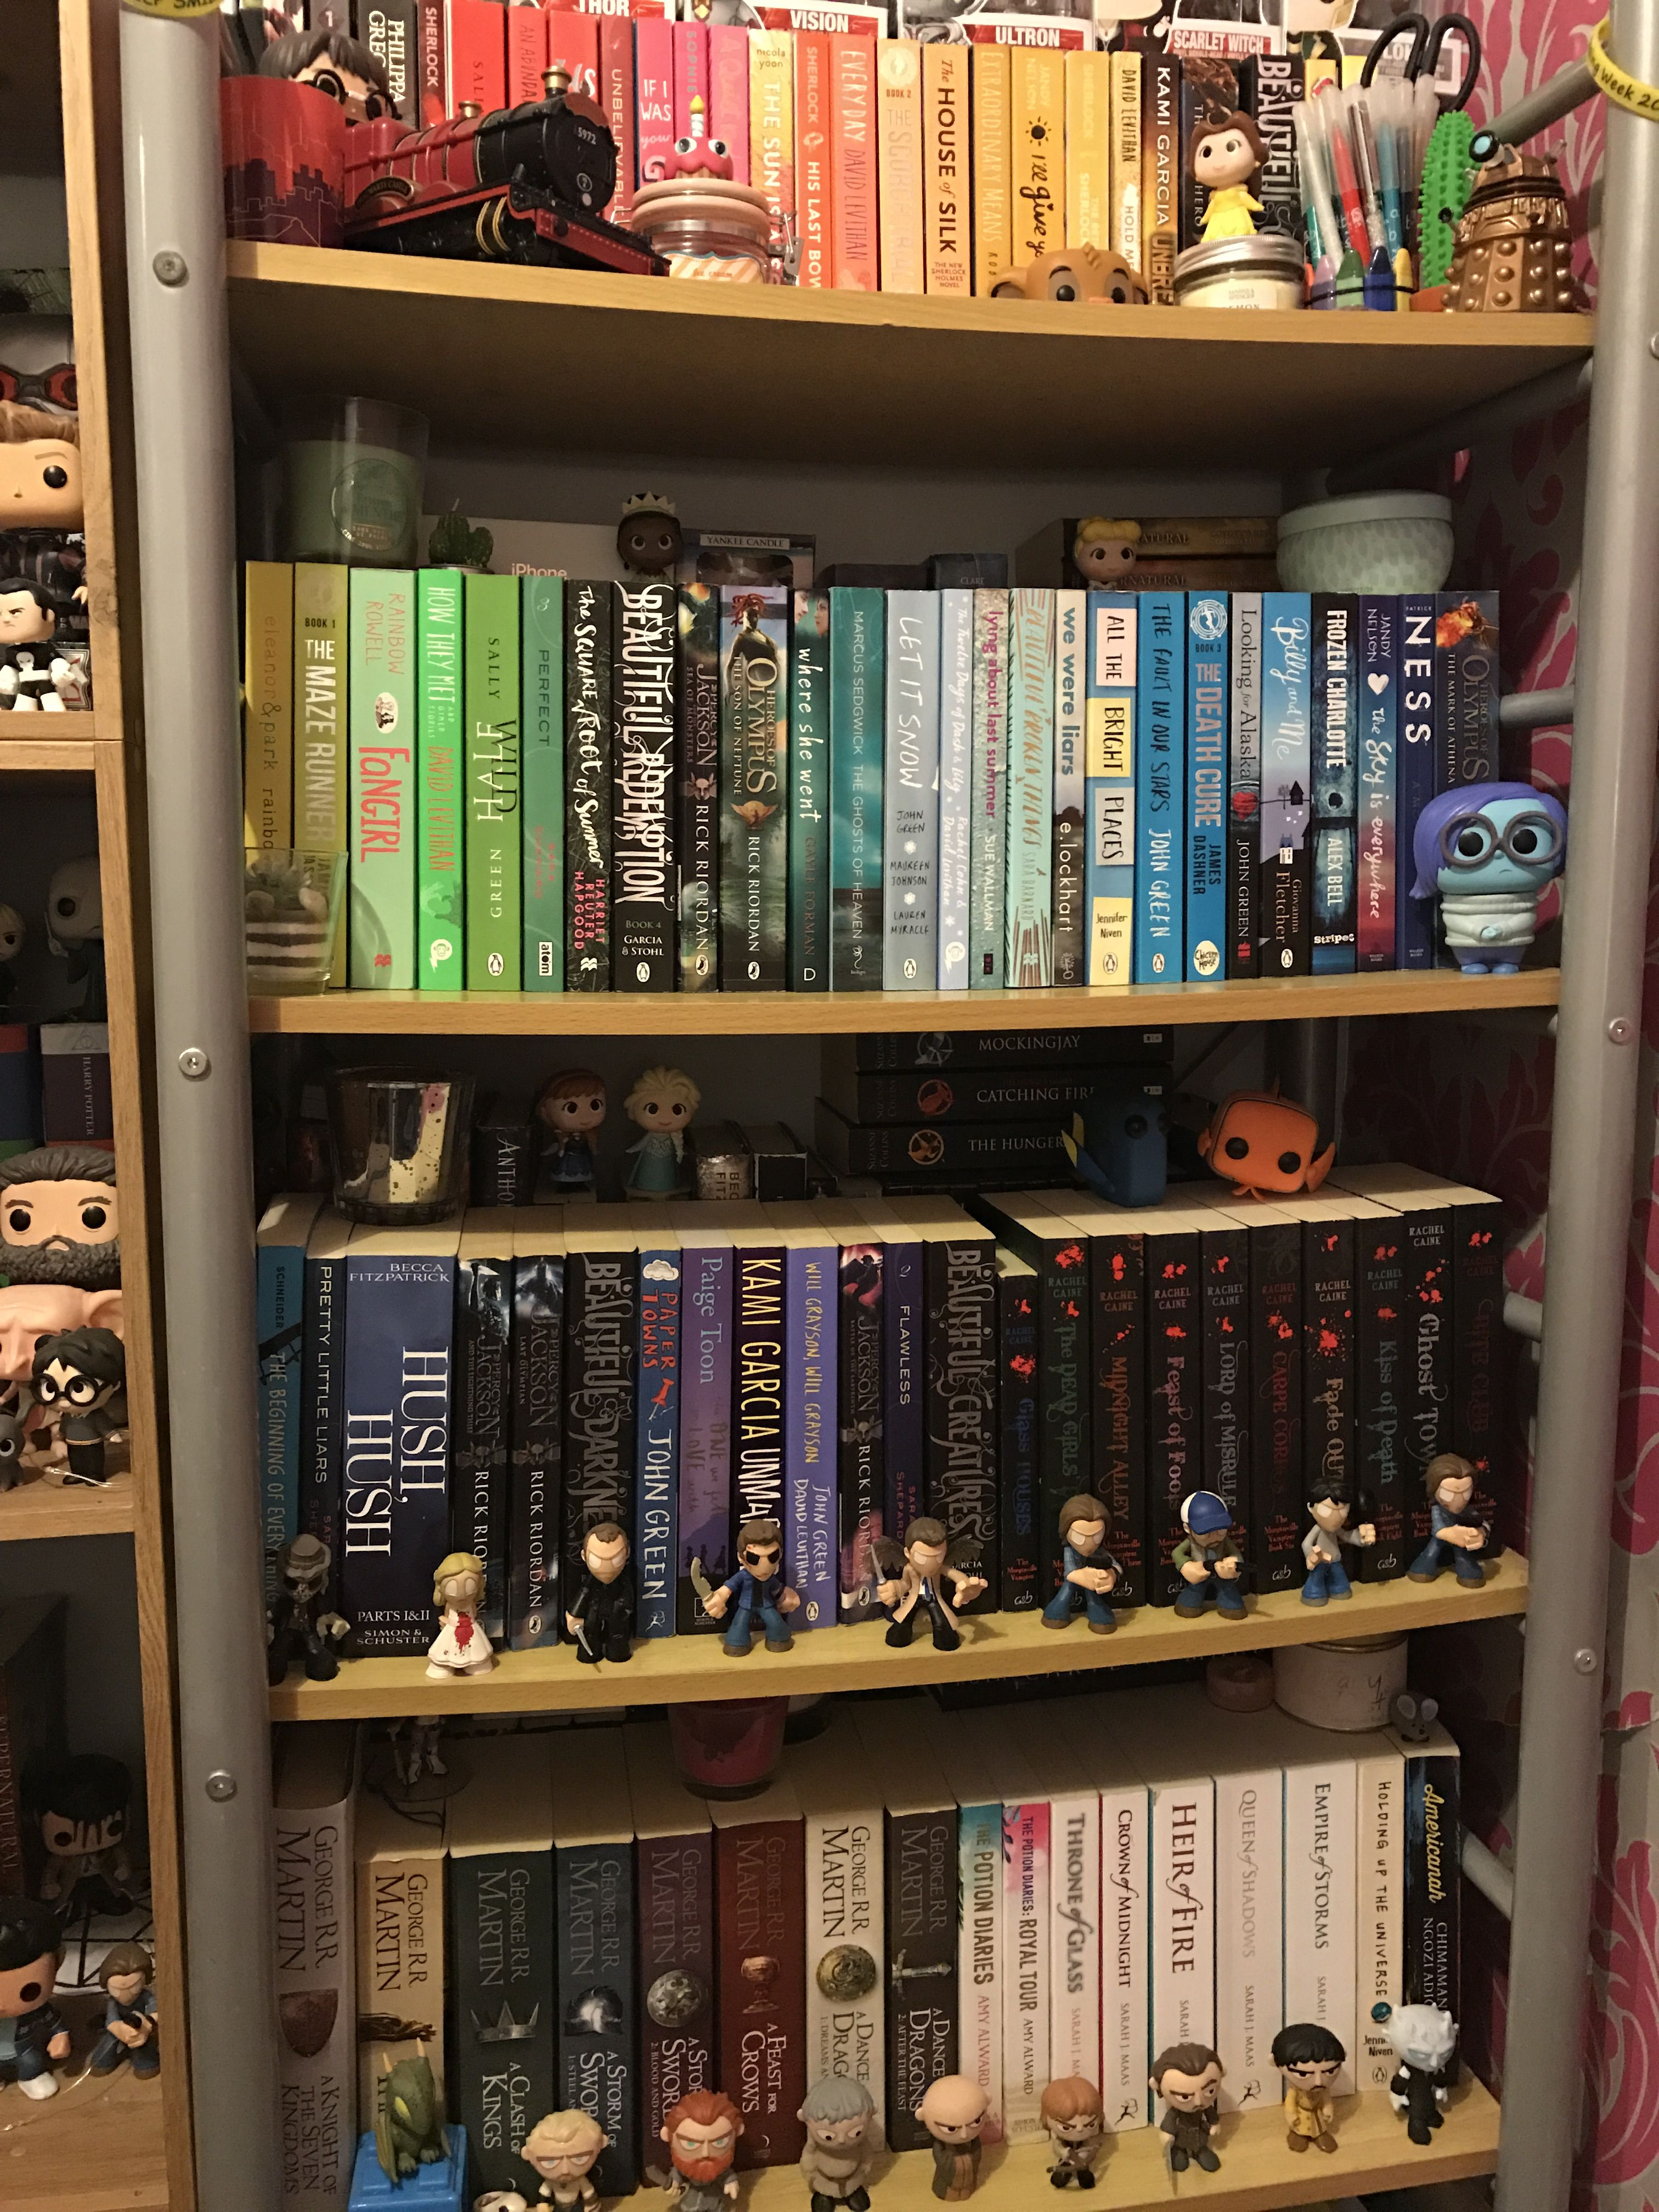 Pin By Sonia Gomez On Book And Fandom Stuff Bookshelves Book Nooks Bookshelf Plans